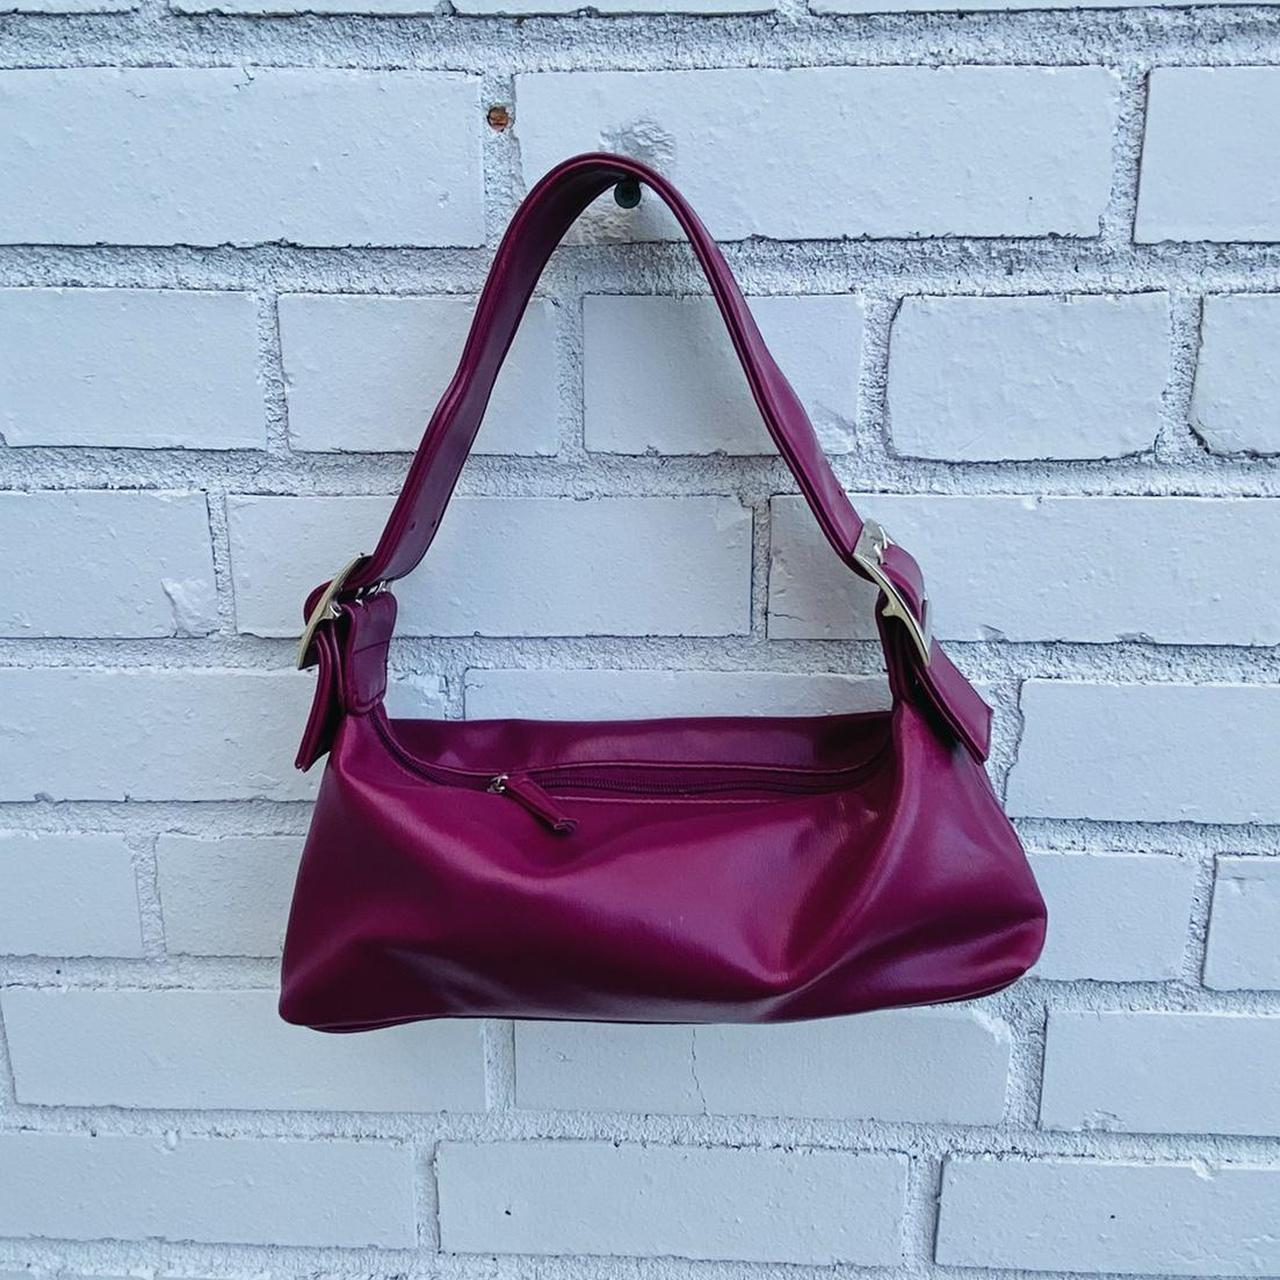 Product Image 1 - Y2k hobo bag  Deep magenta